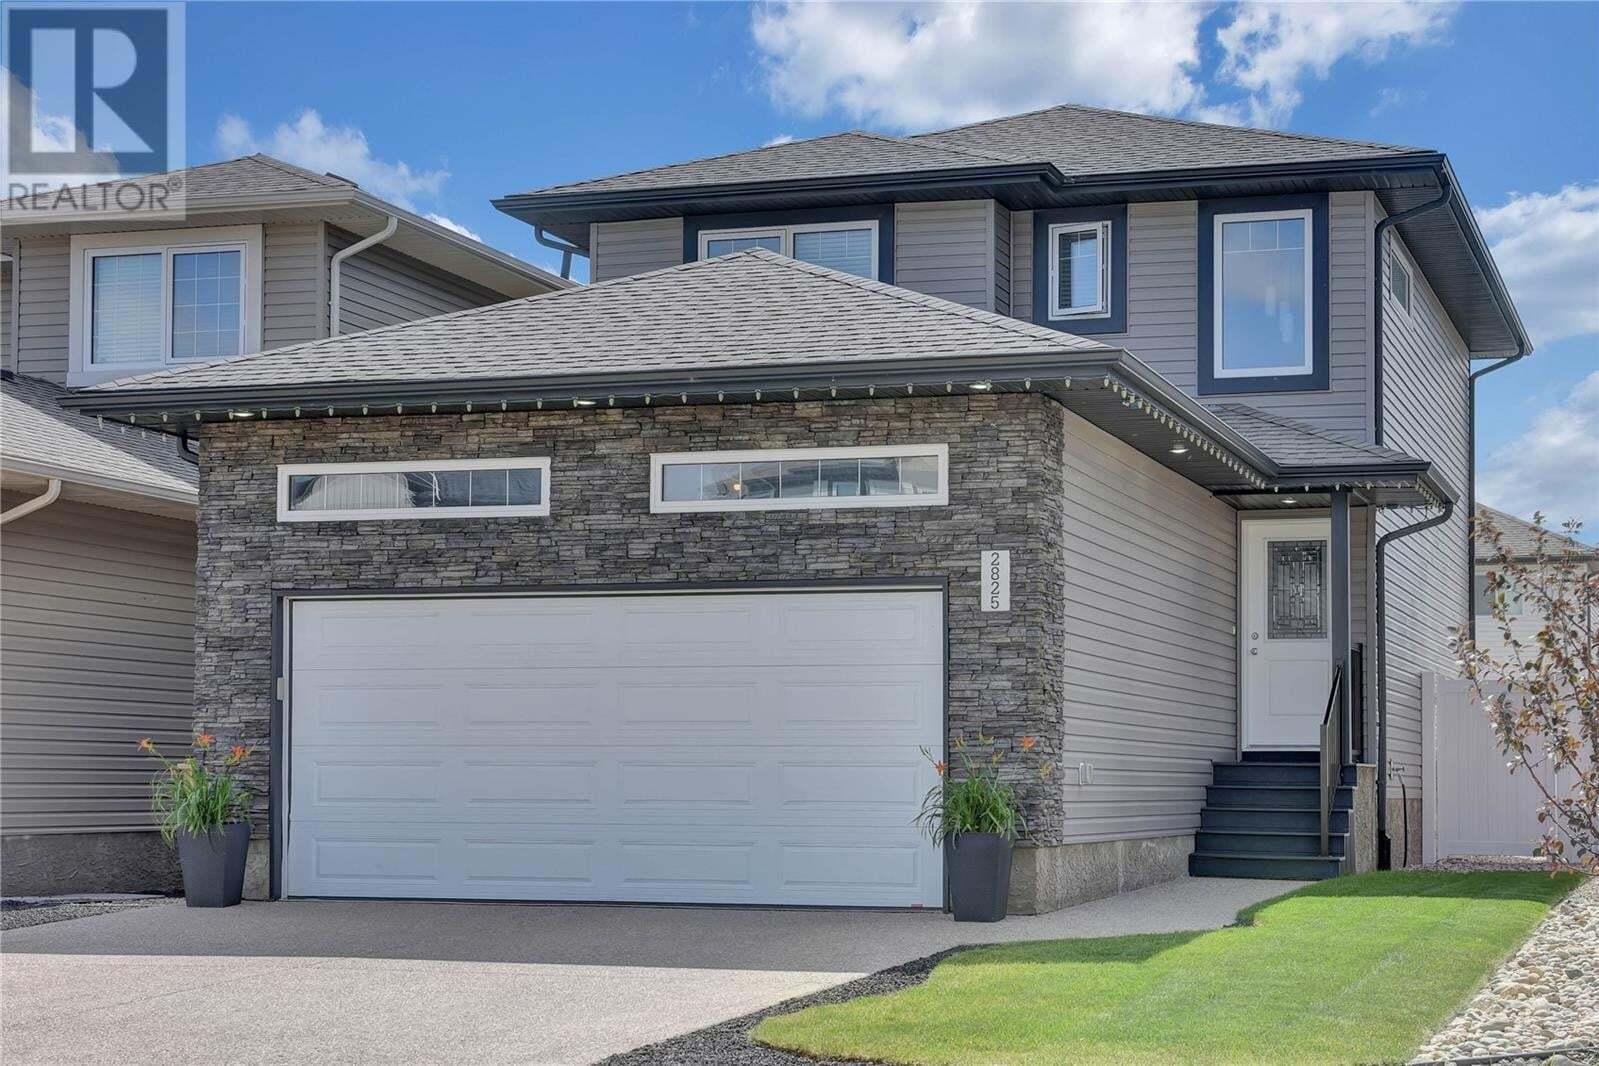 House for sale at 2825 Elgaard Dr Regina Saskatchewan - MLS: SK821865